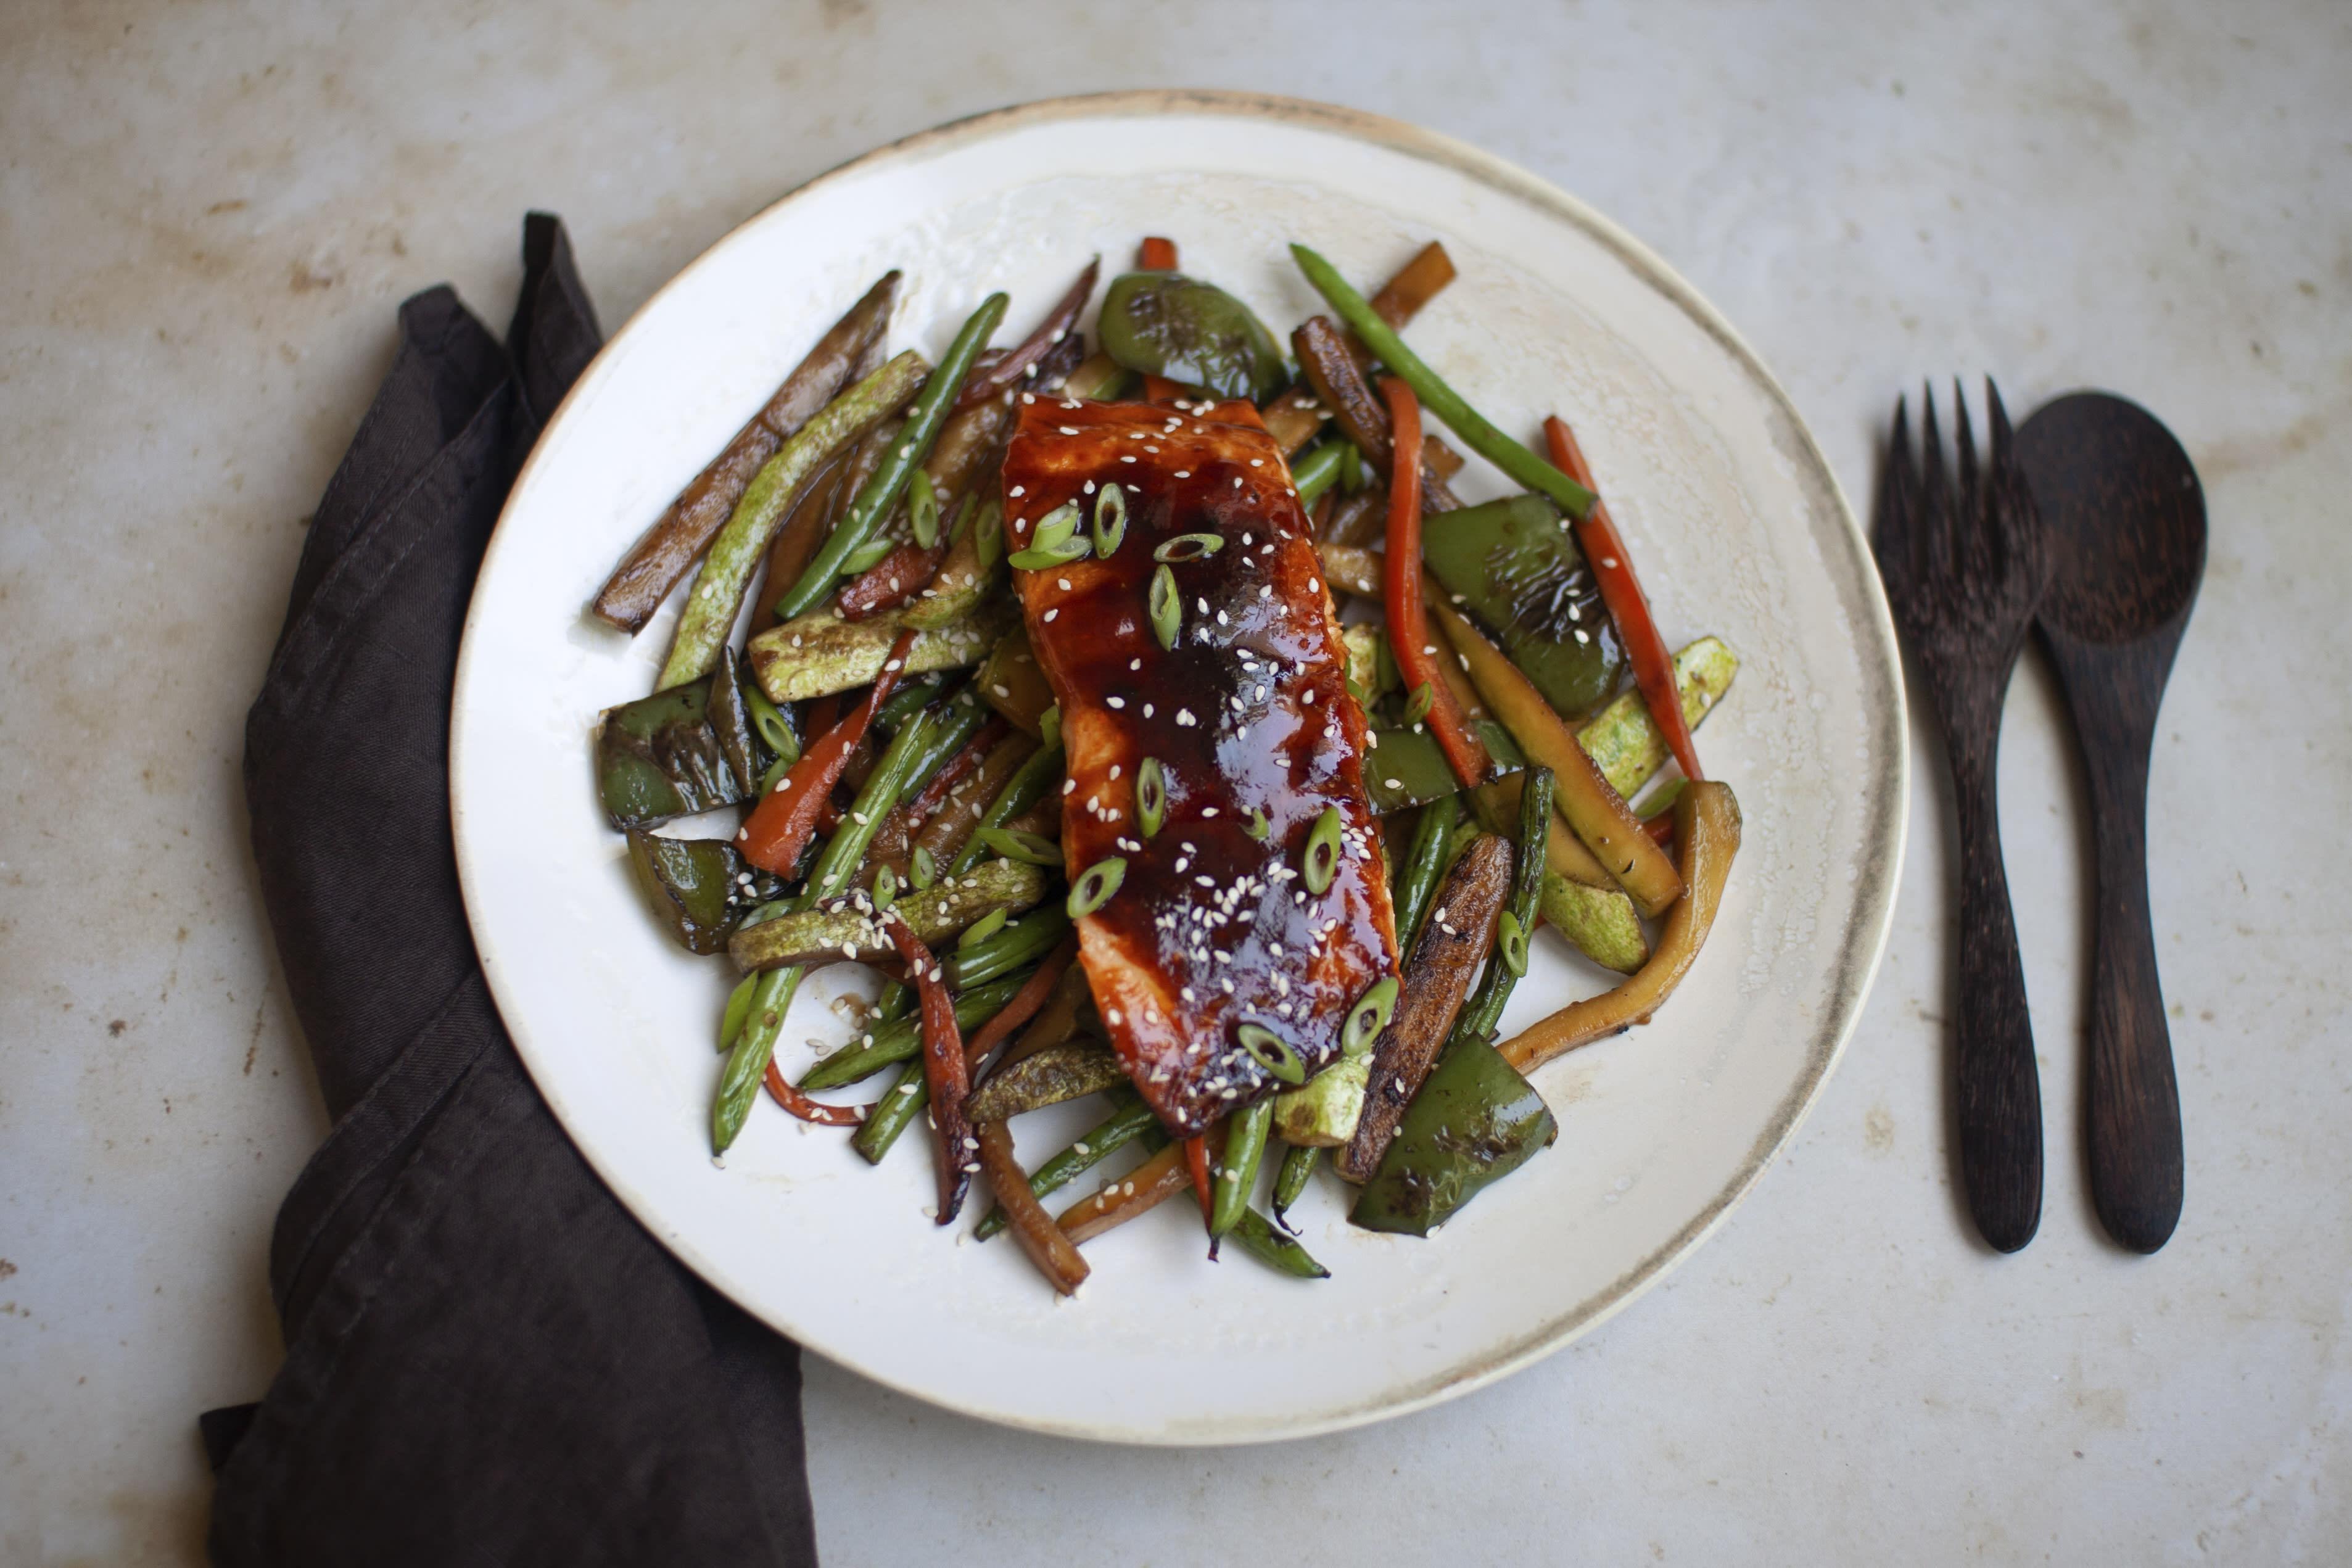 Salmon Teriyaki with Stir-Fried Vegetables